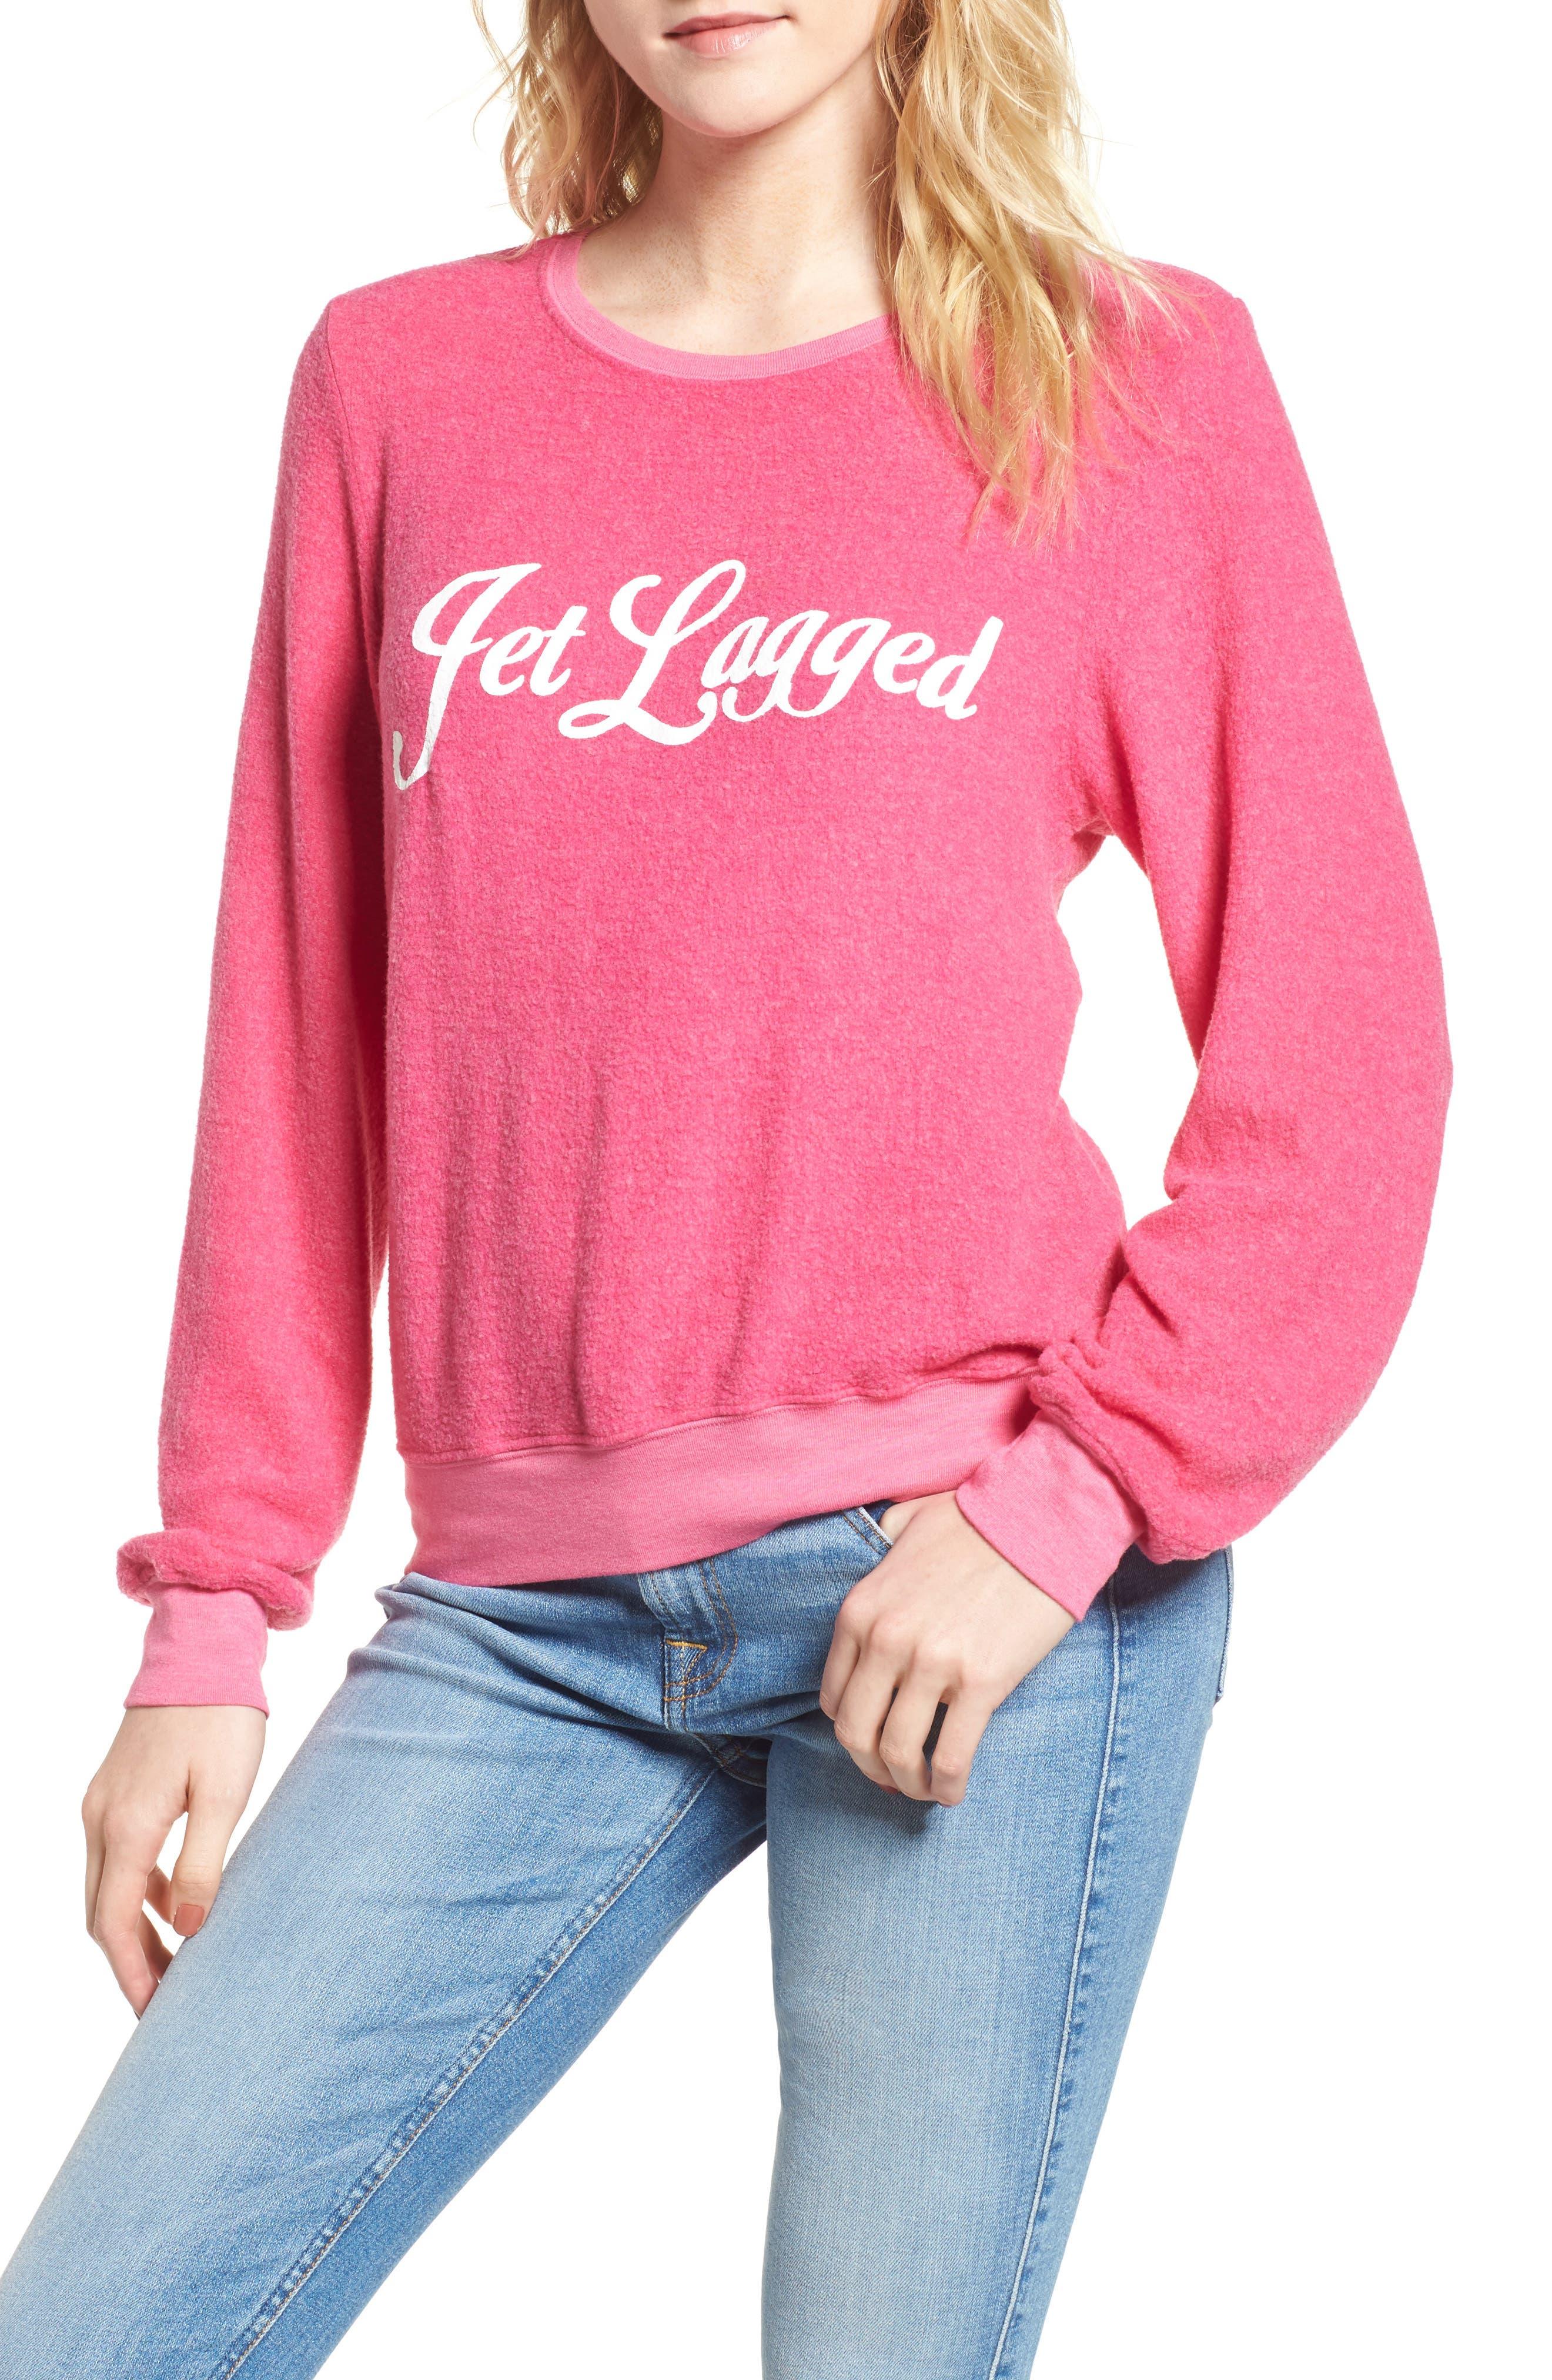 Jet Lagged Sweatshirt,                             Main thumbnail 1, color,                             Malibu Pink